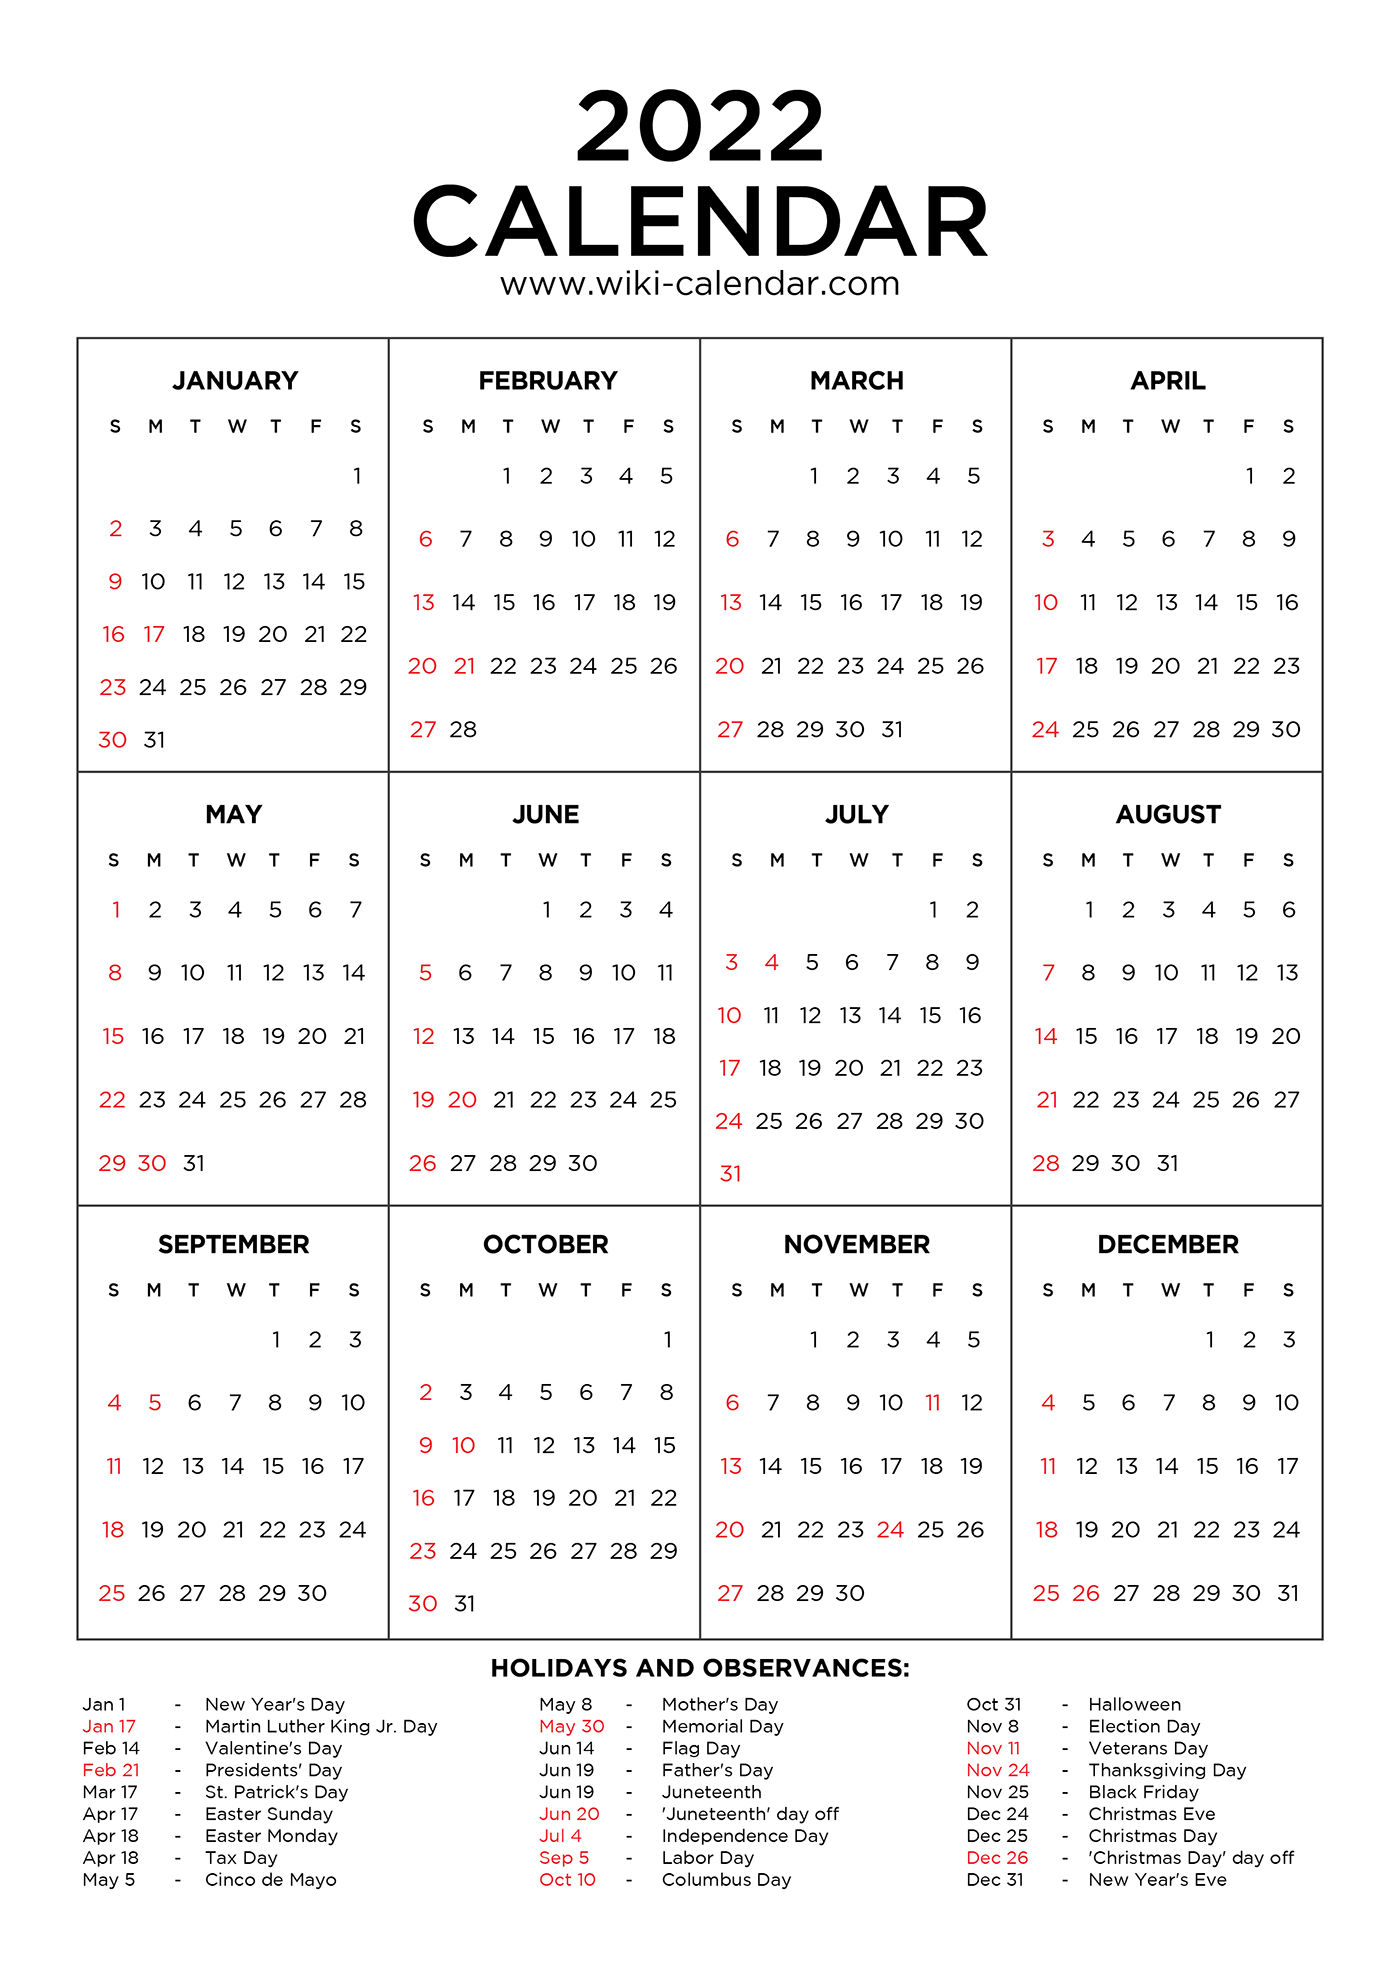 2022 Calendar Printable with Holidays